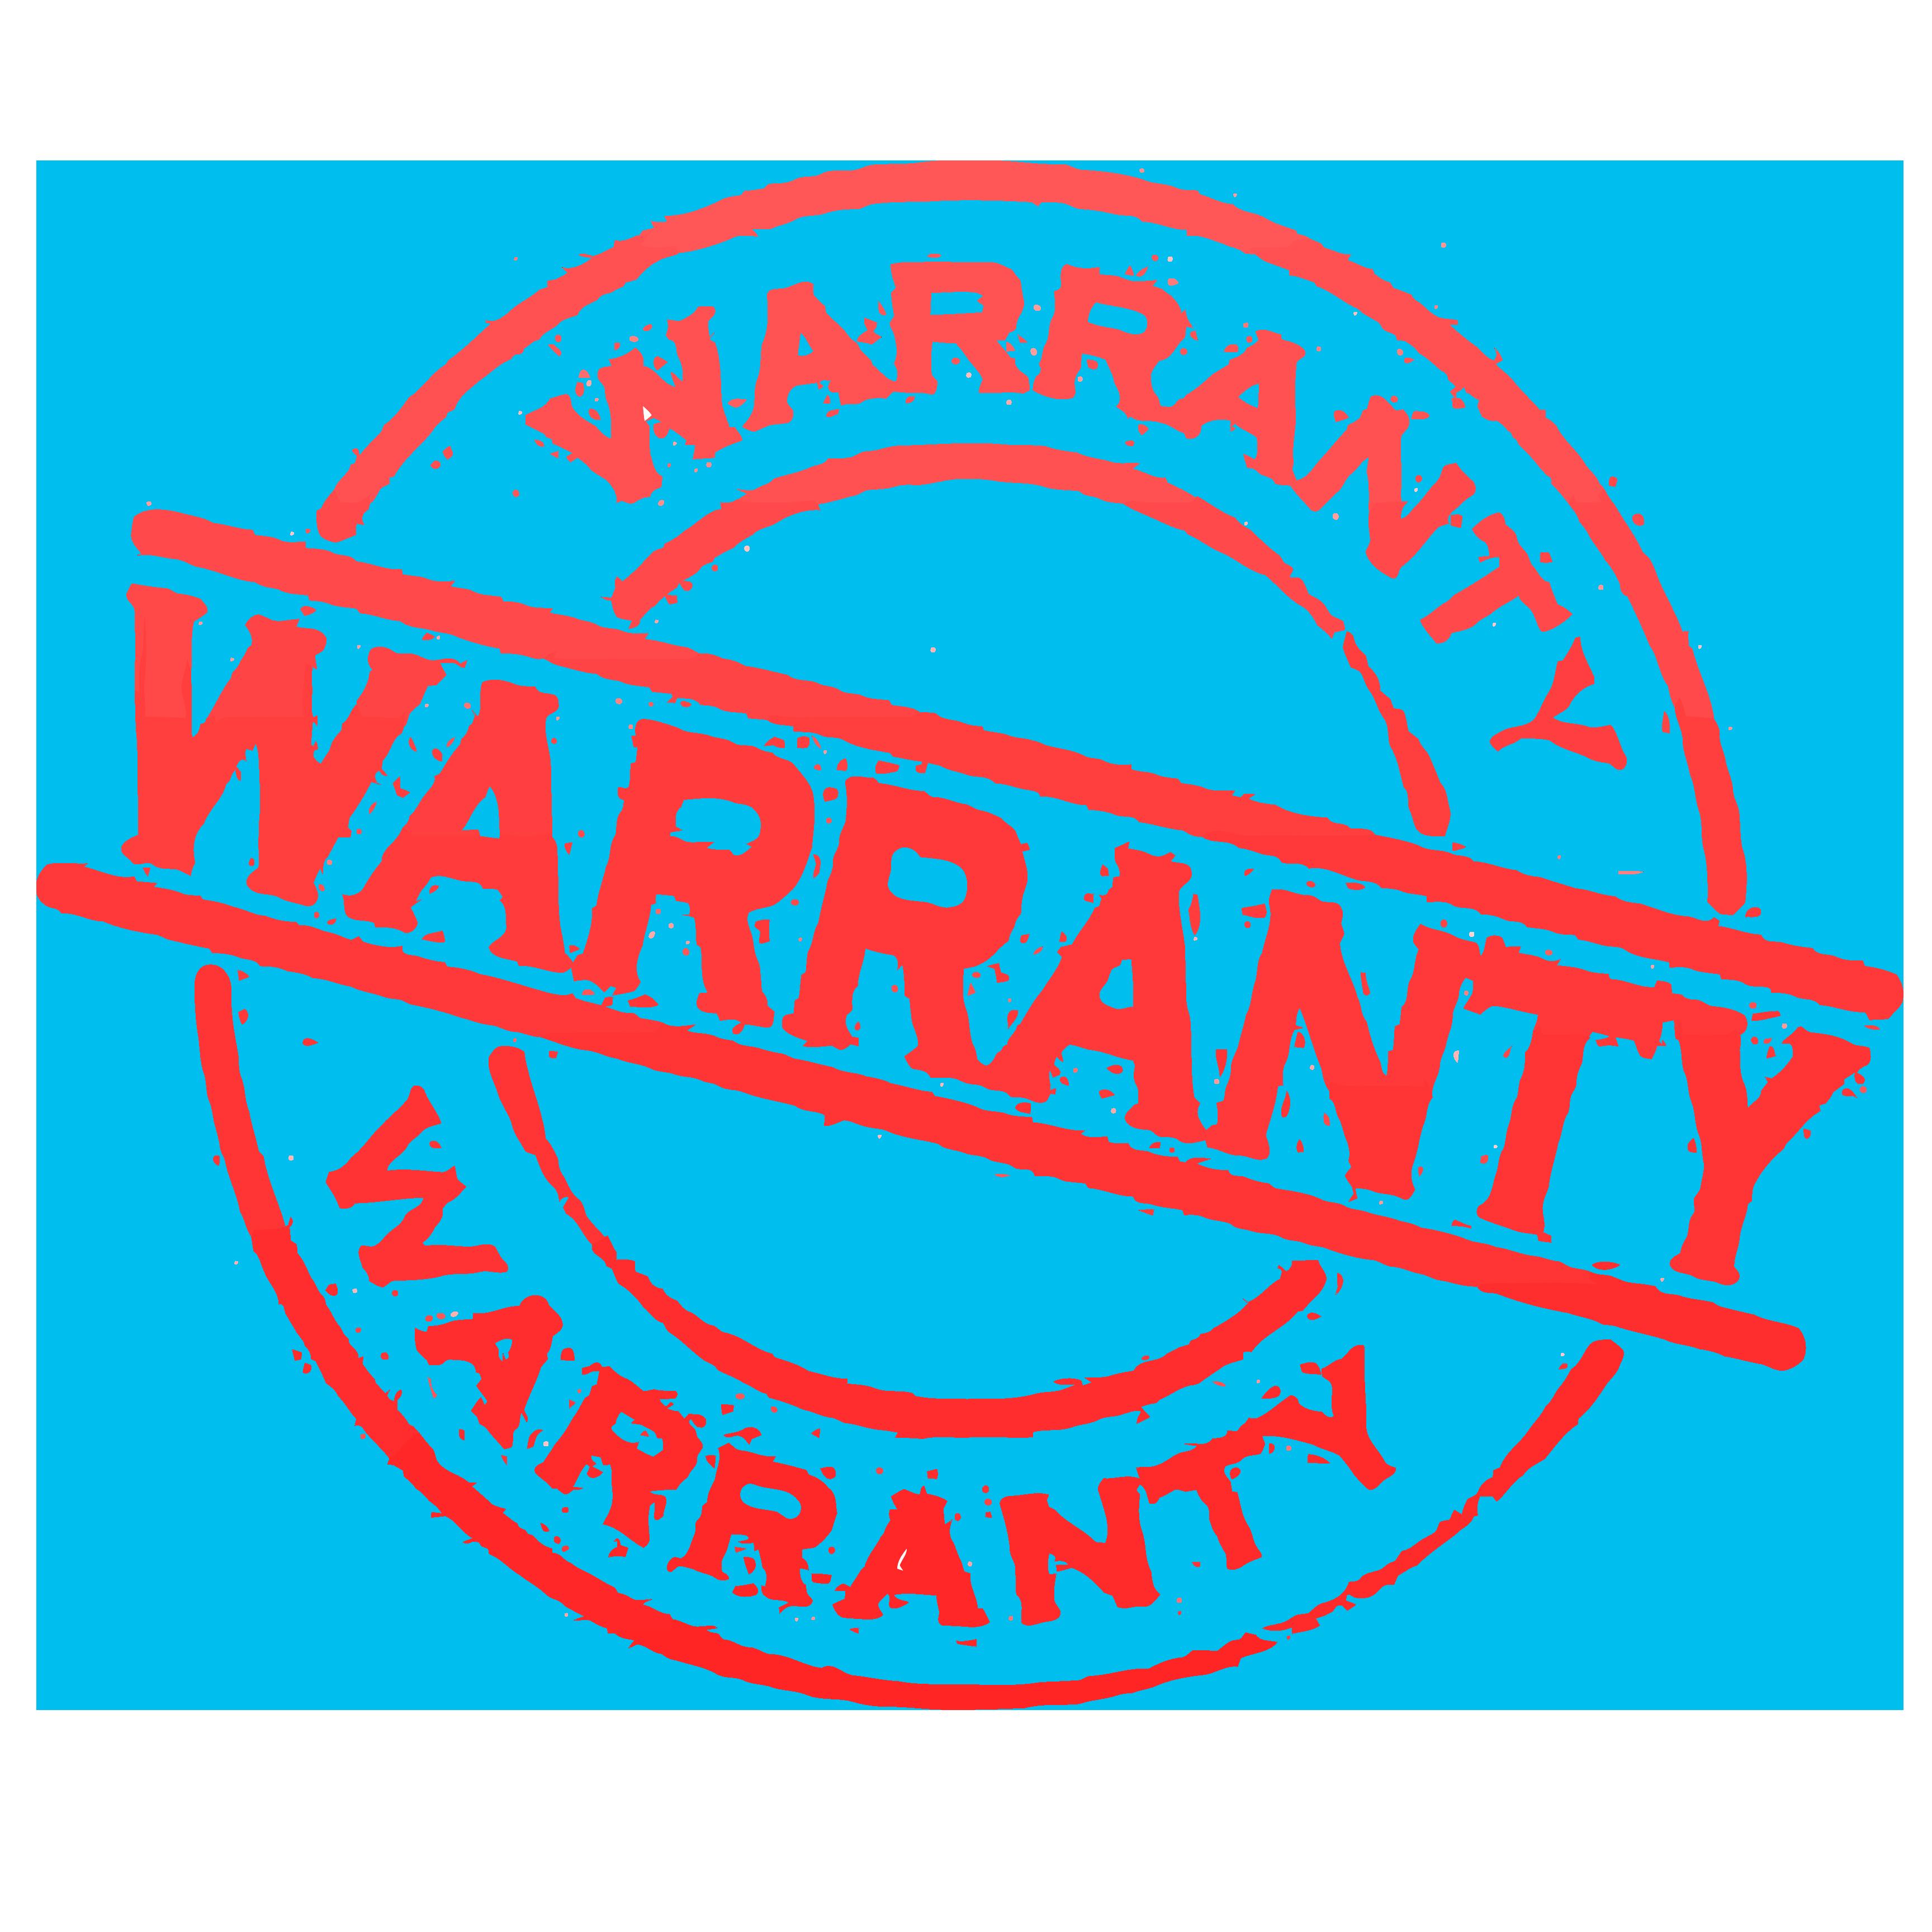 warrantylogo_vectorized (1)